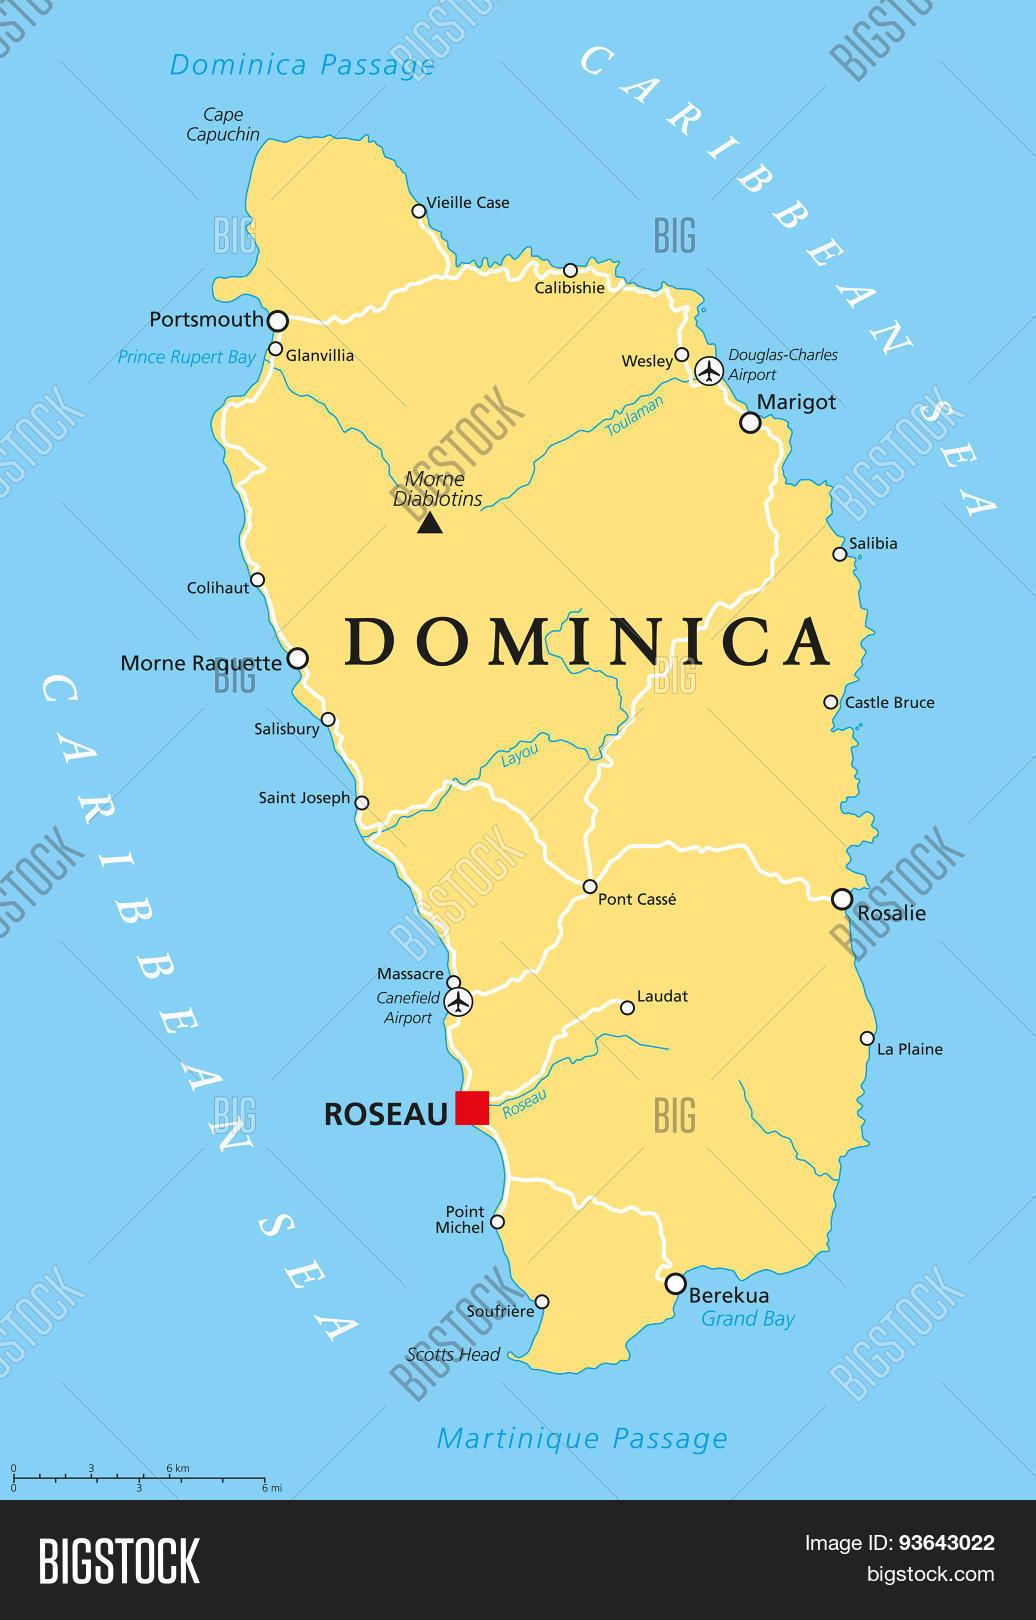 Dominica Political Map Vector Photo Bigstock - Dominica political map